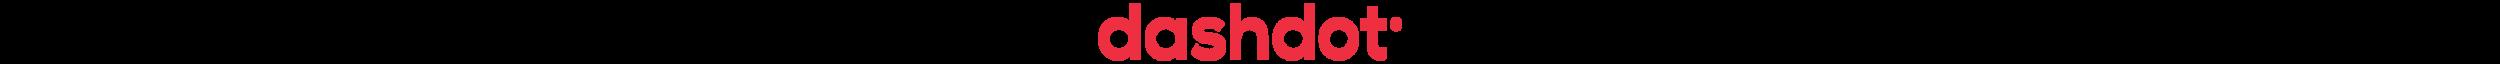 dashdot-logo.png